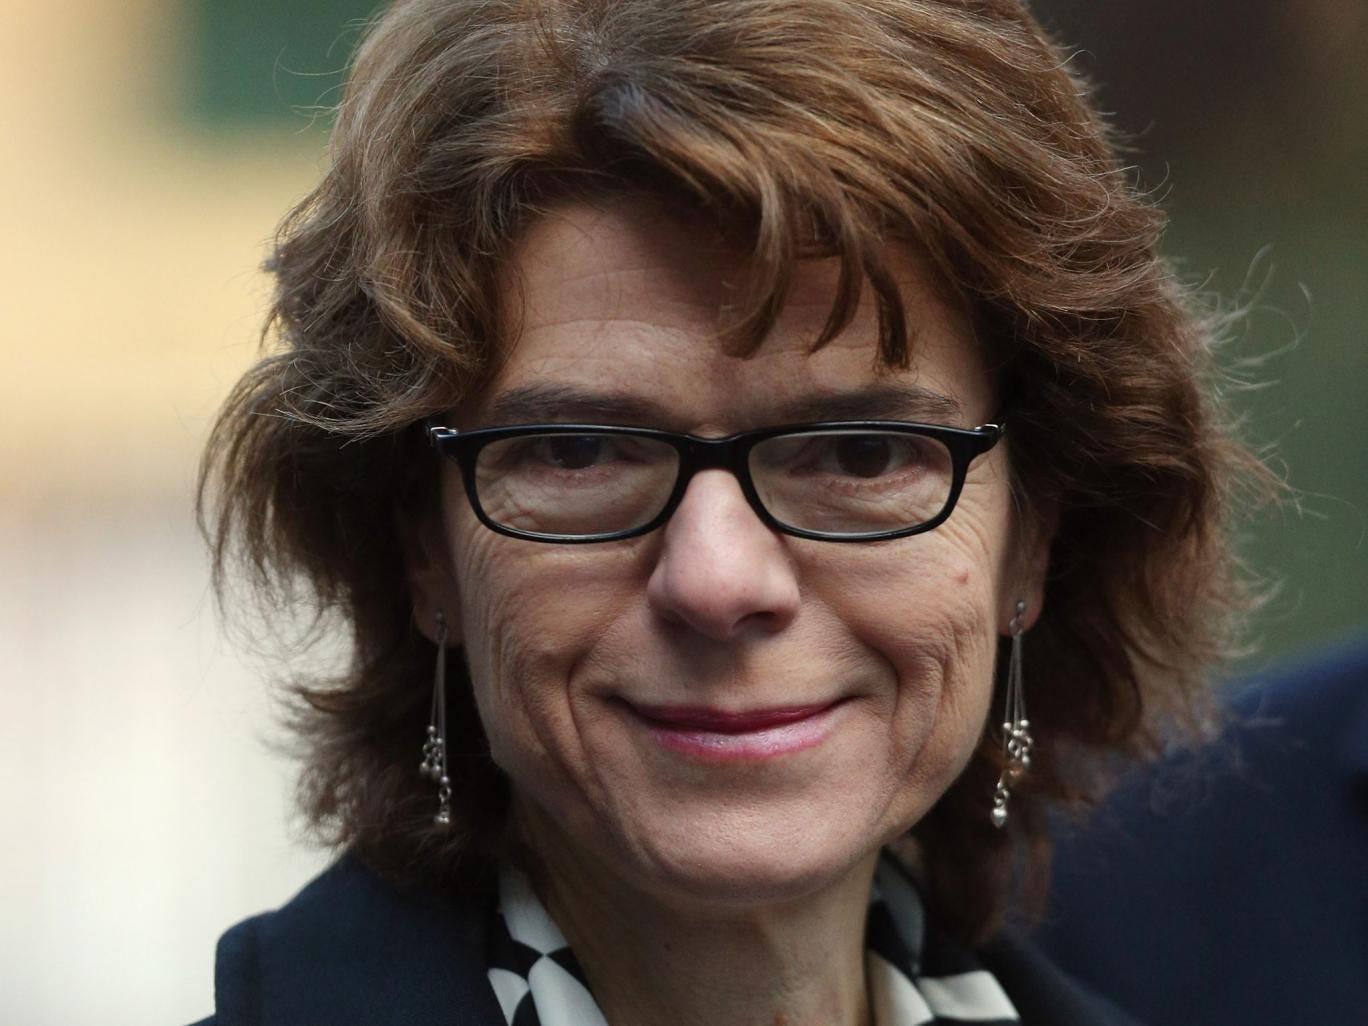 Janet Street-Porter: Vicky Pryce was treated shabbily by her husband